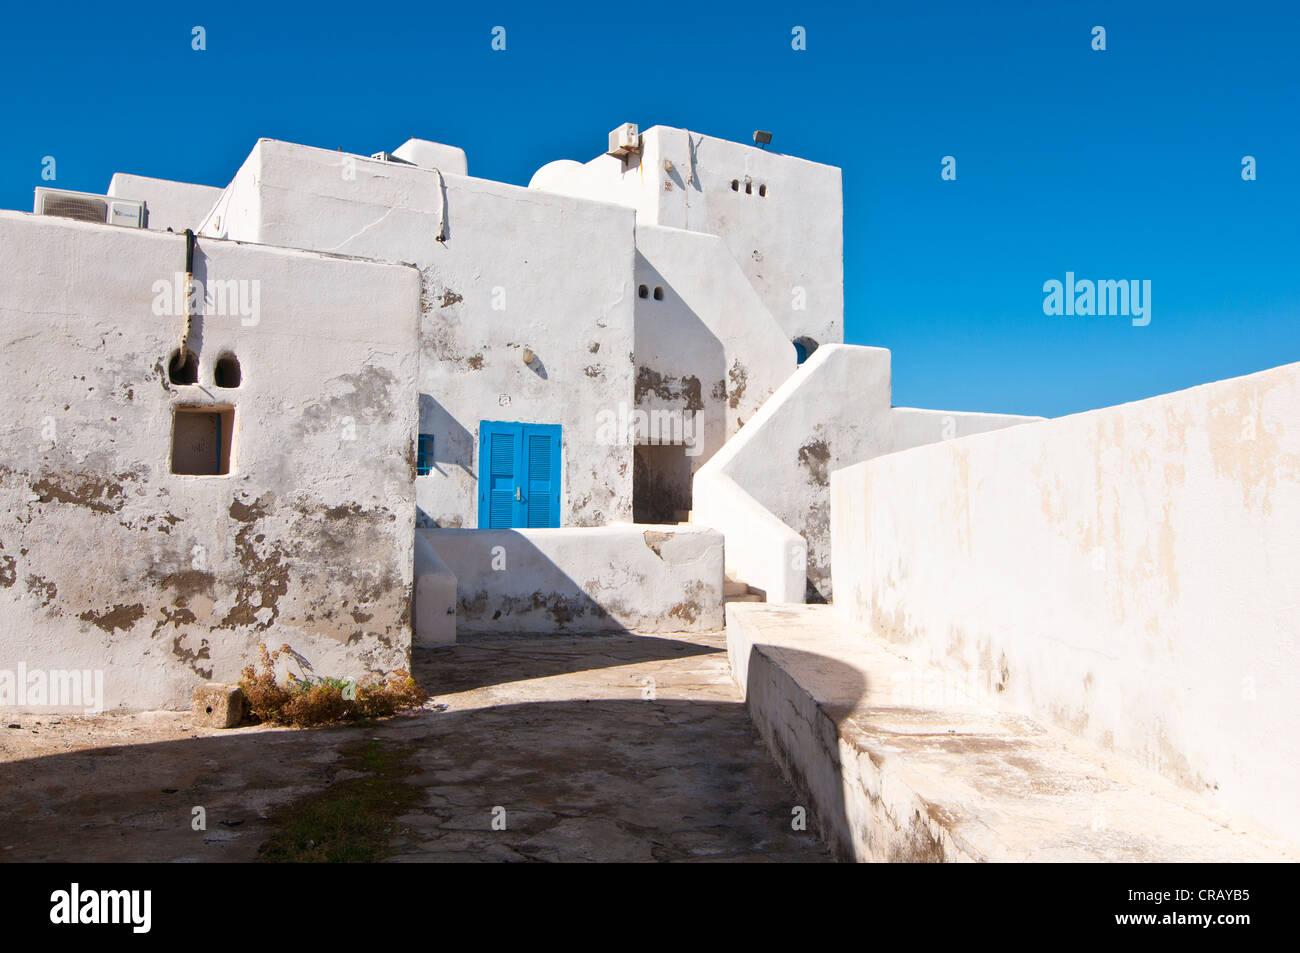 Beach resort Corne d'Or, former stronghold, Tipasa, Algeria, Africa - Stock Image